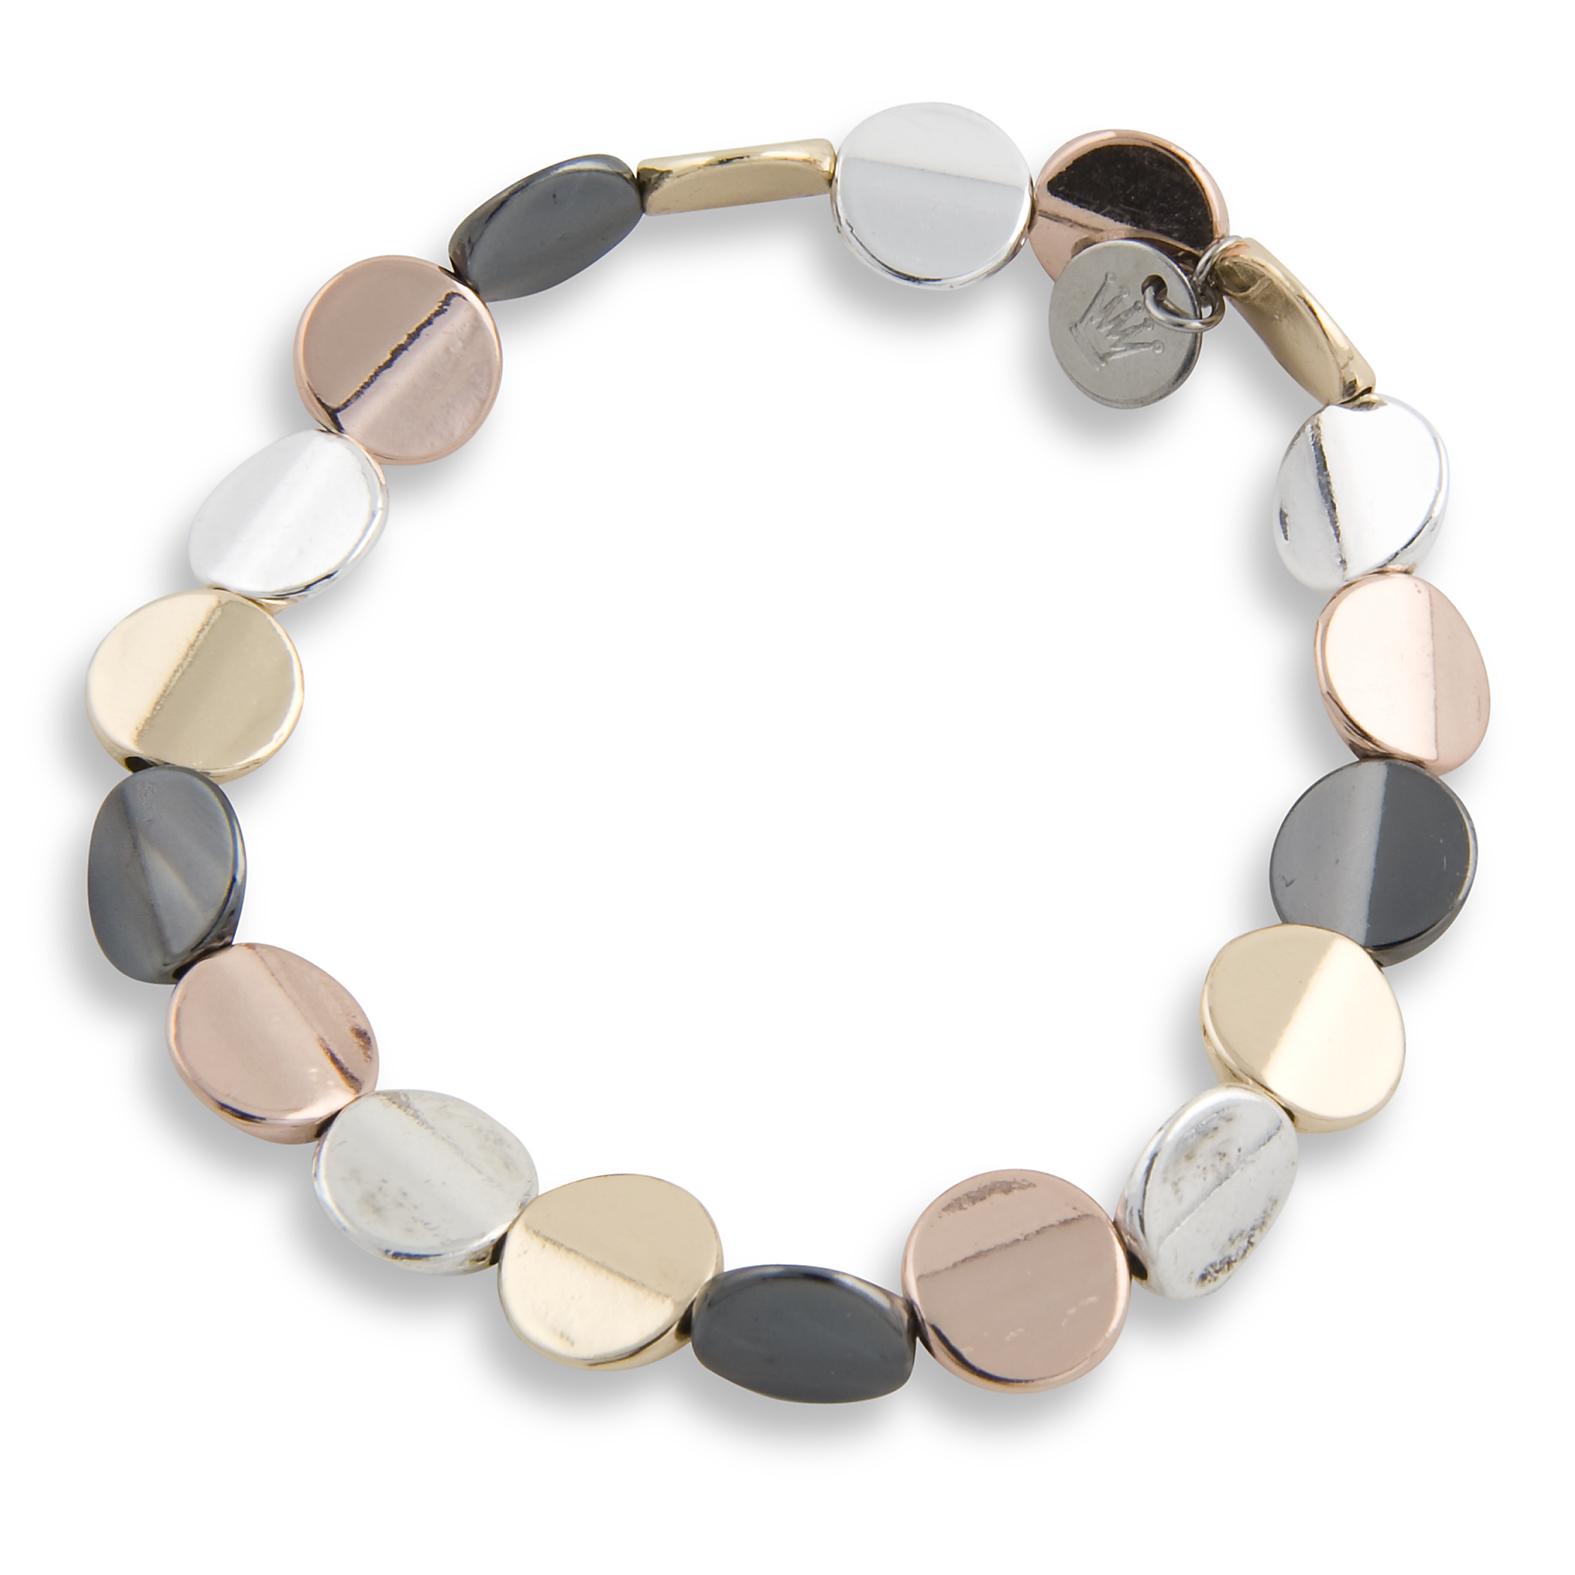 Damsmycke pfg Stockholm Pearls for Girls-Lotta Bracelet 94554-12